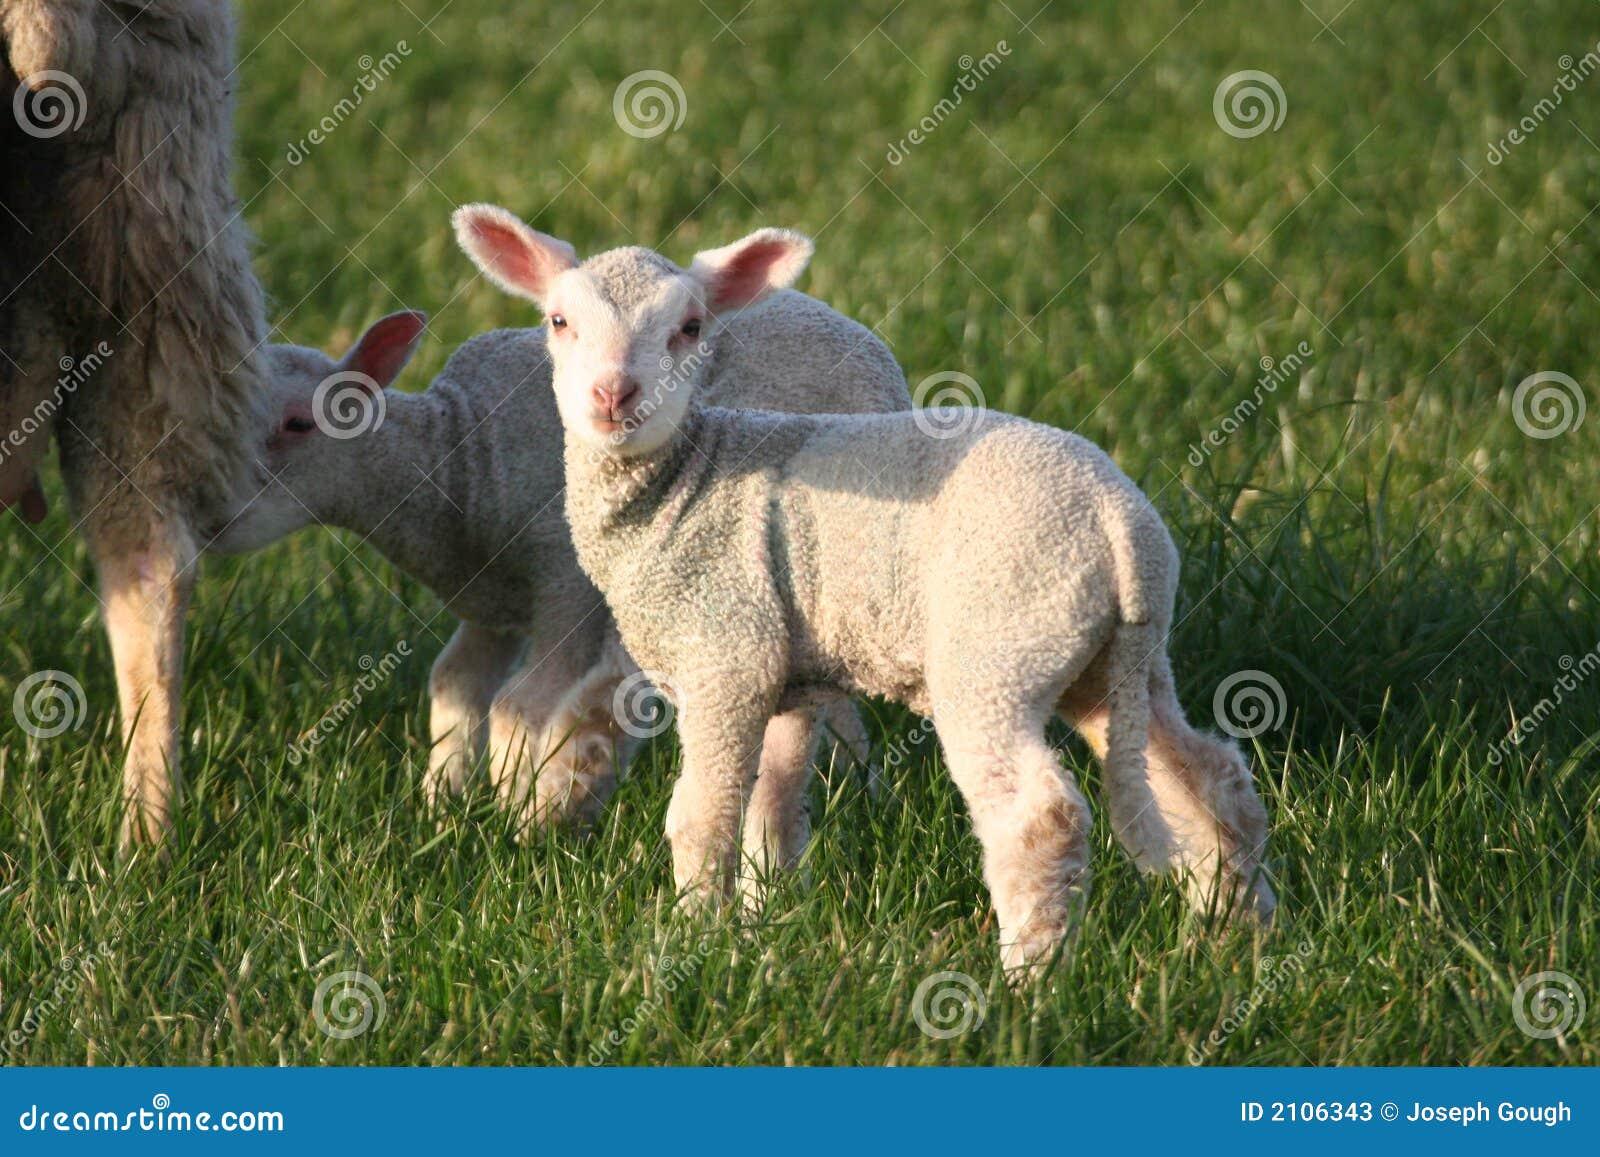 Download Lambs stock image. Image of animal, field, lamb, curious - 2106343